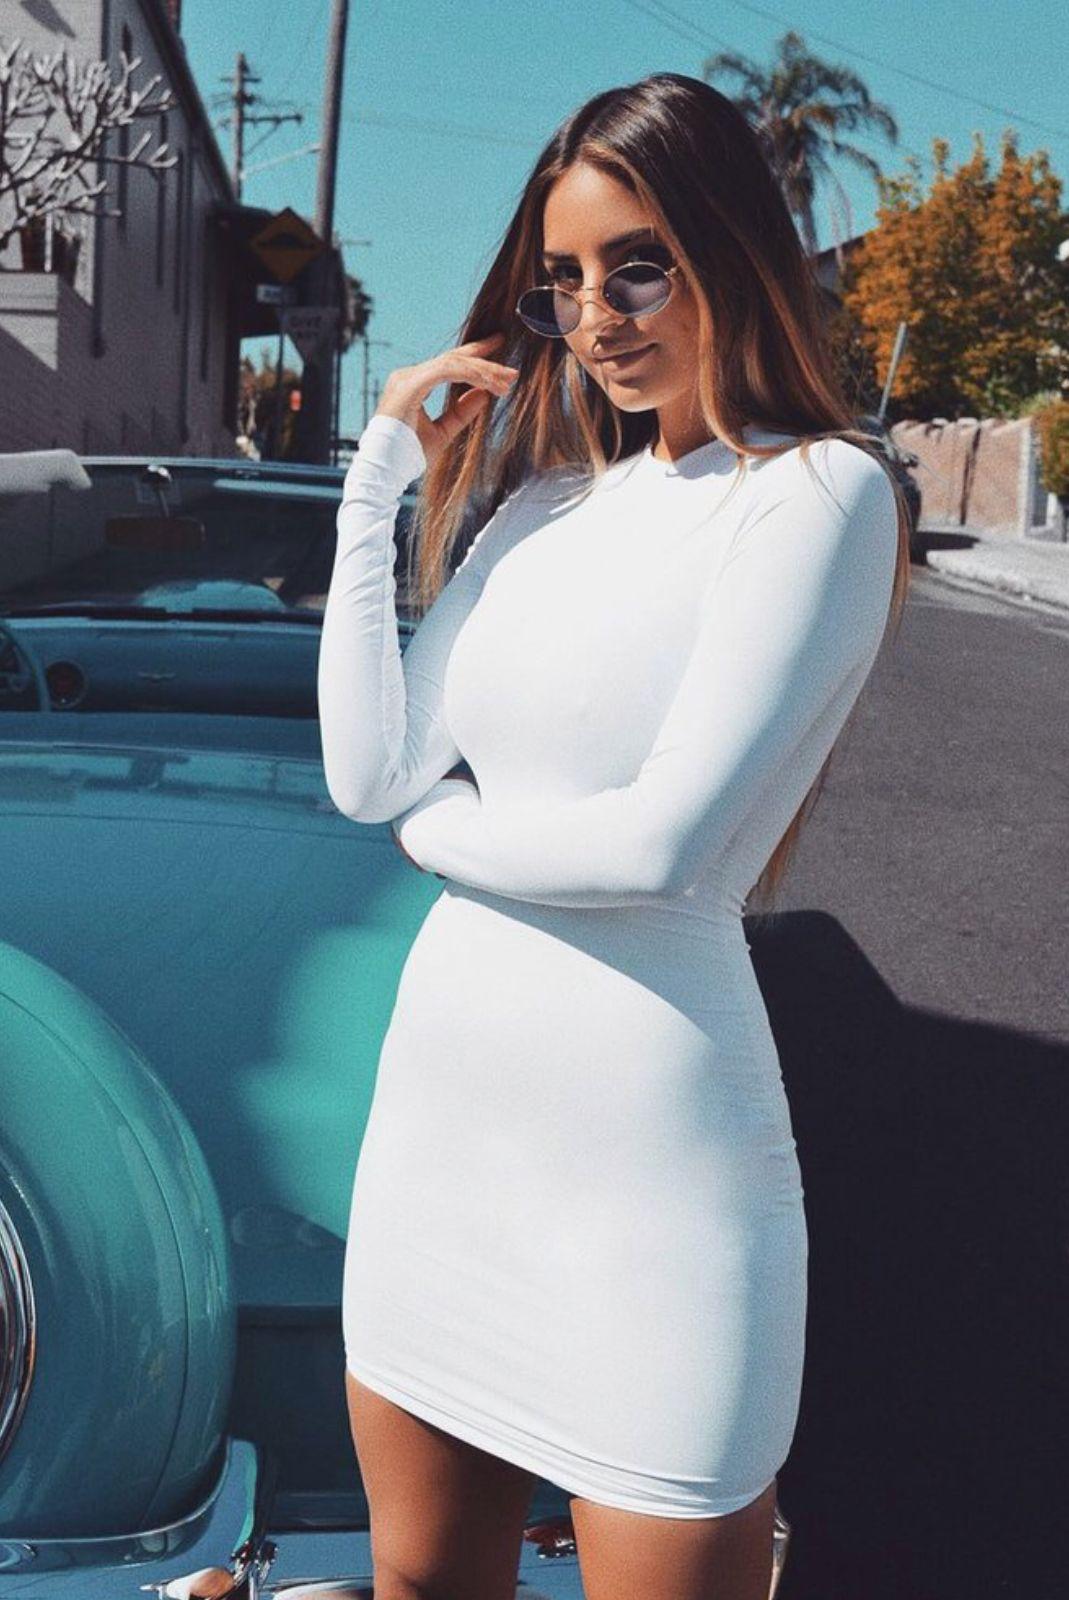 Meshki Kylie Long Sleeve Dress White 44 Tight Long Sleeve Dress White Long Sleeve Dress White Tight Dresses [ 1600 x 1069 Pixel ]